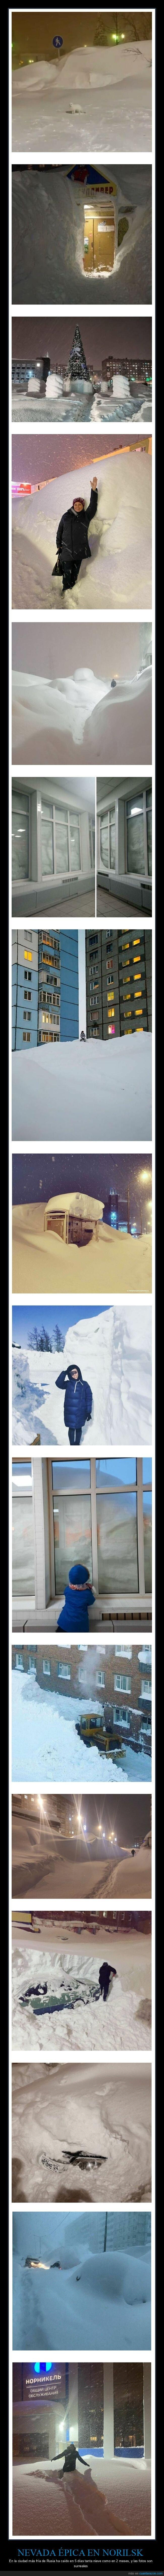 nevada,nieve,norilsk,rusia